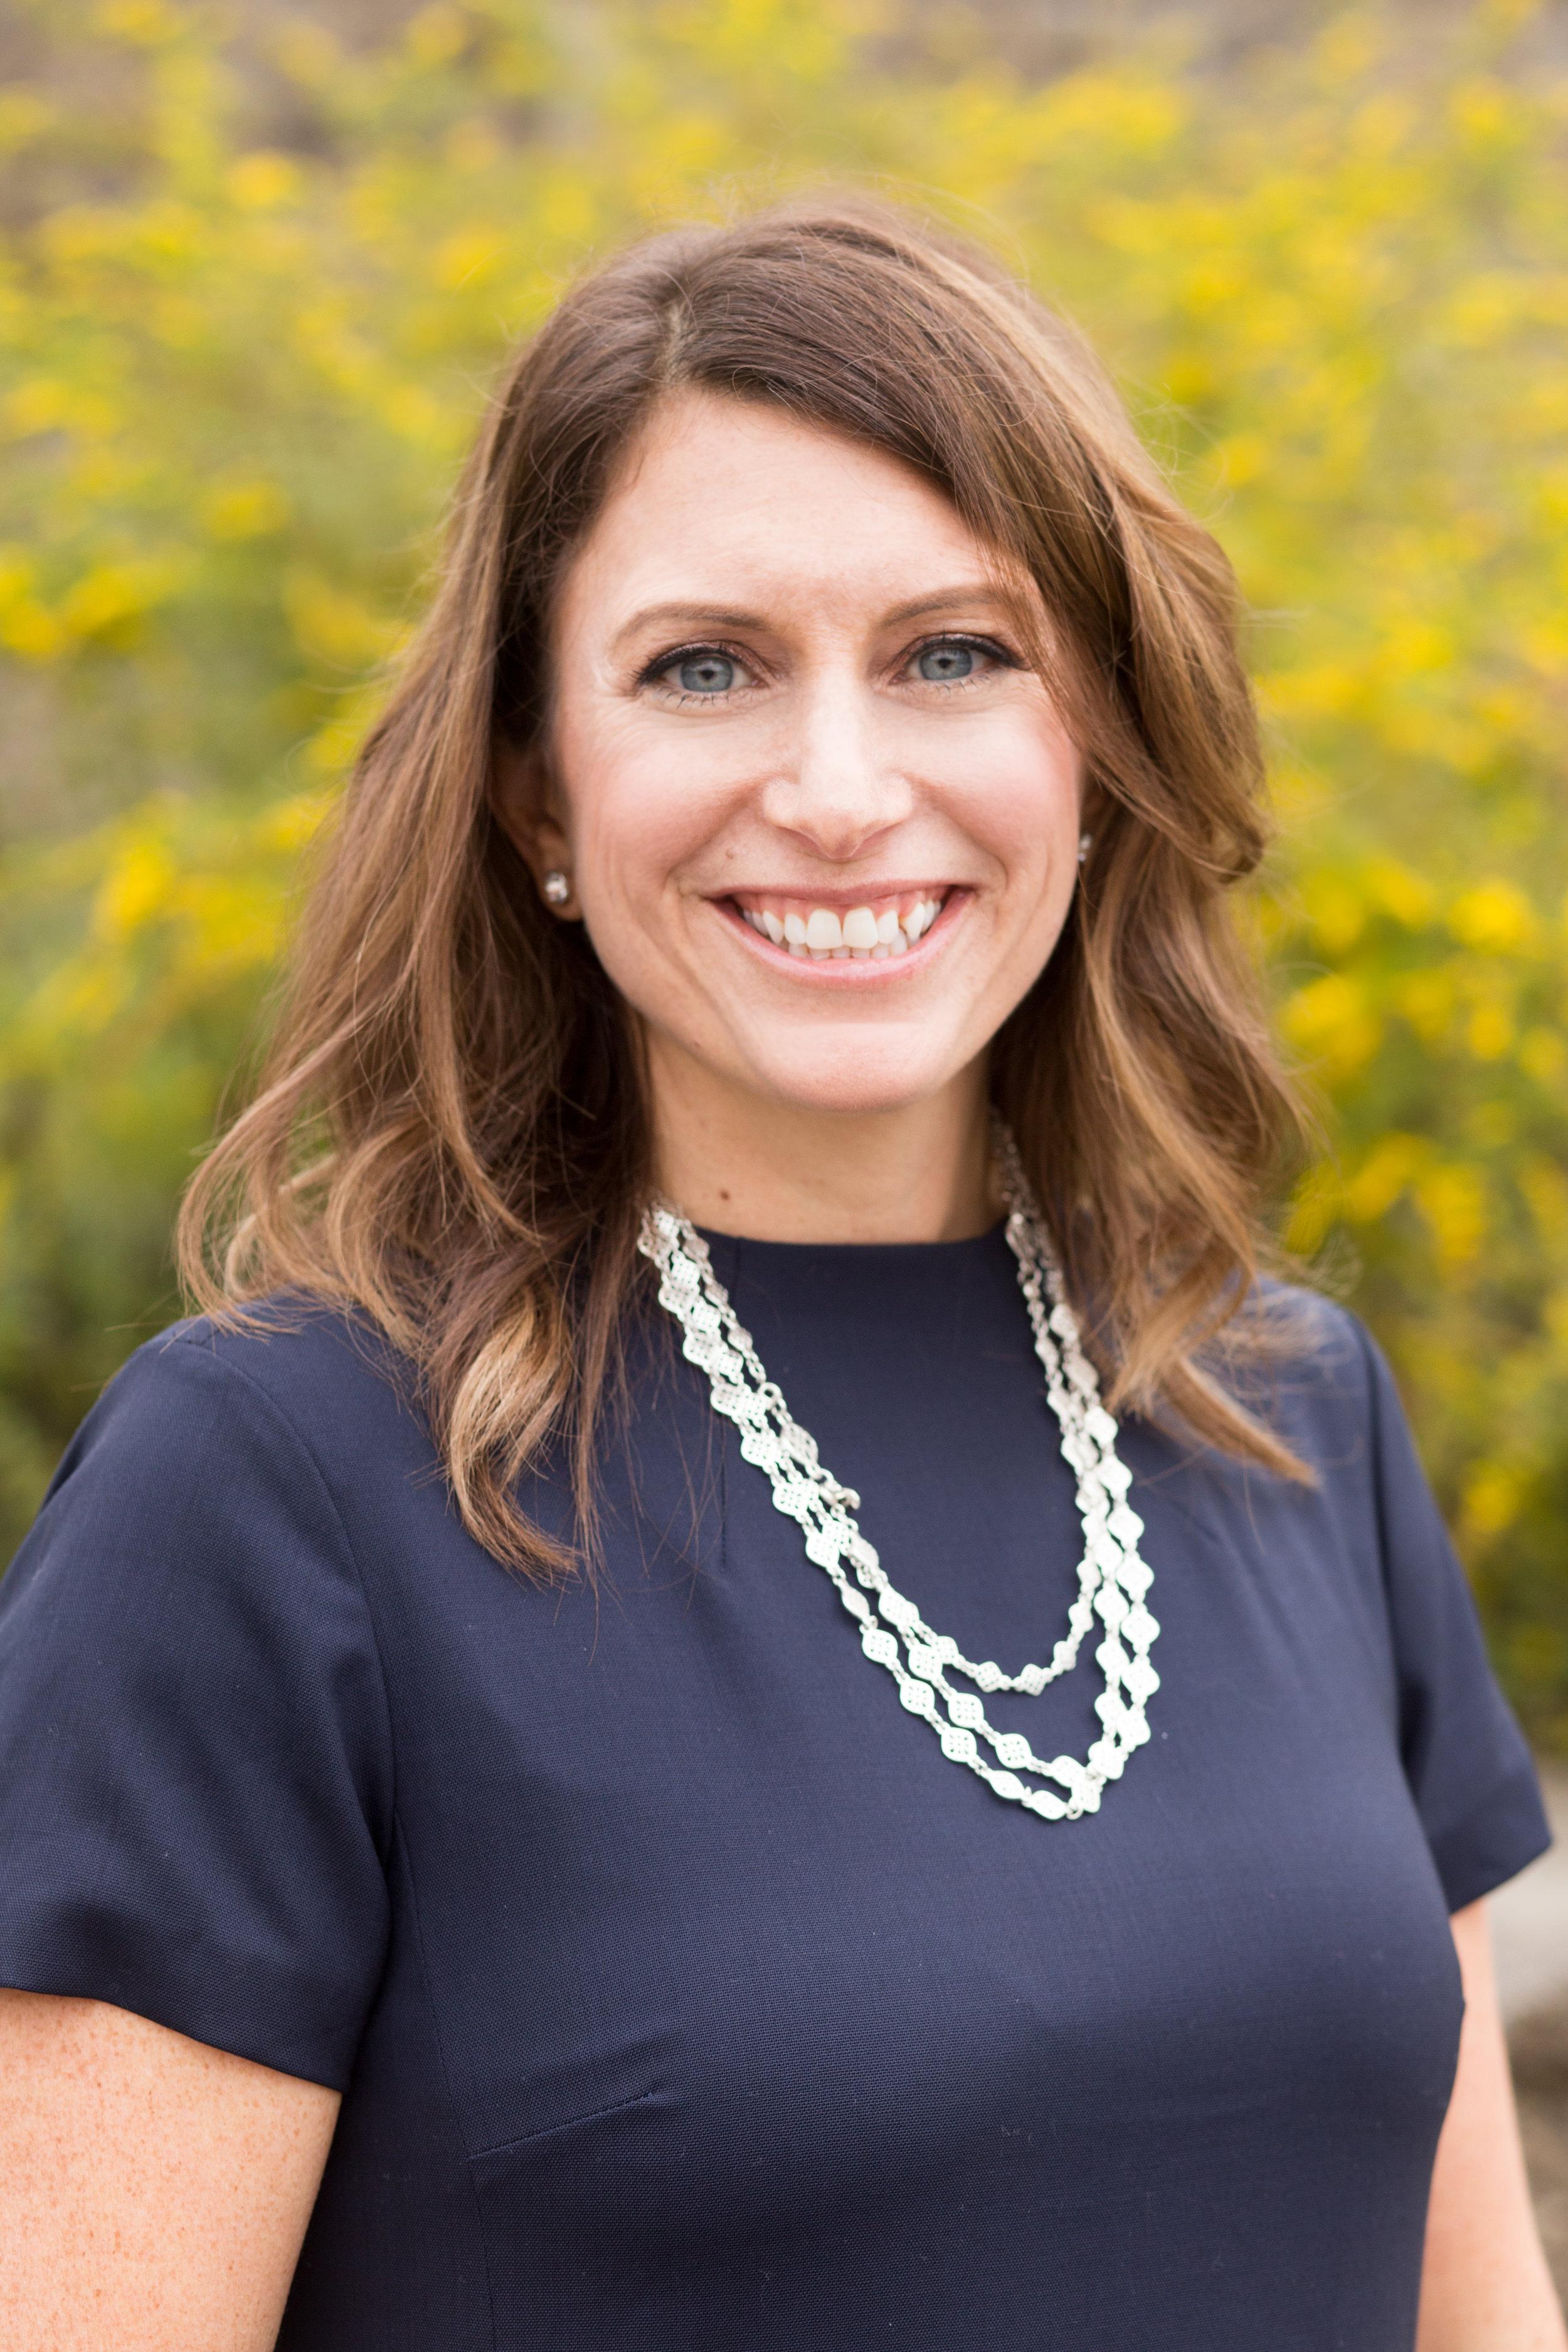 Dr. Michelle Cutler, Licensed Clinical Psychologist  773-417-6342   mcutler@drcutlerandassociates.com